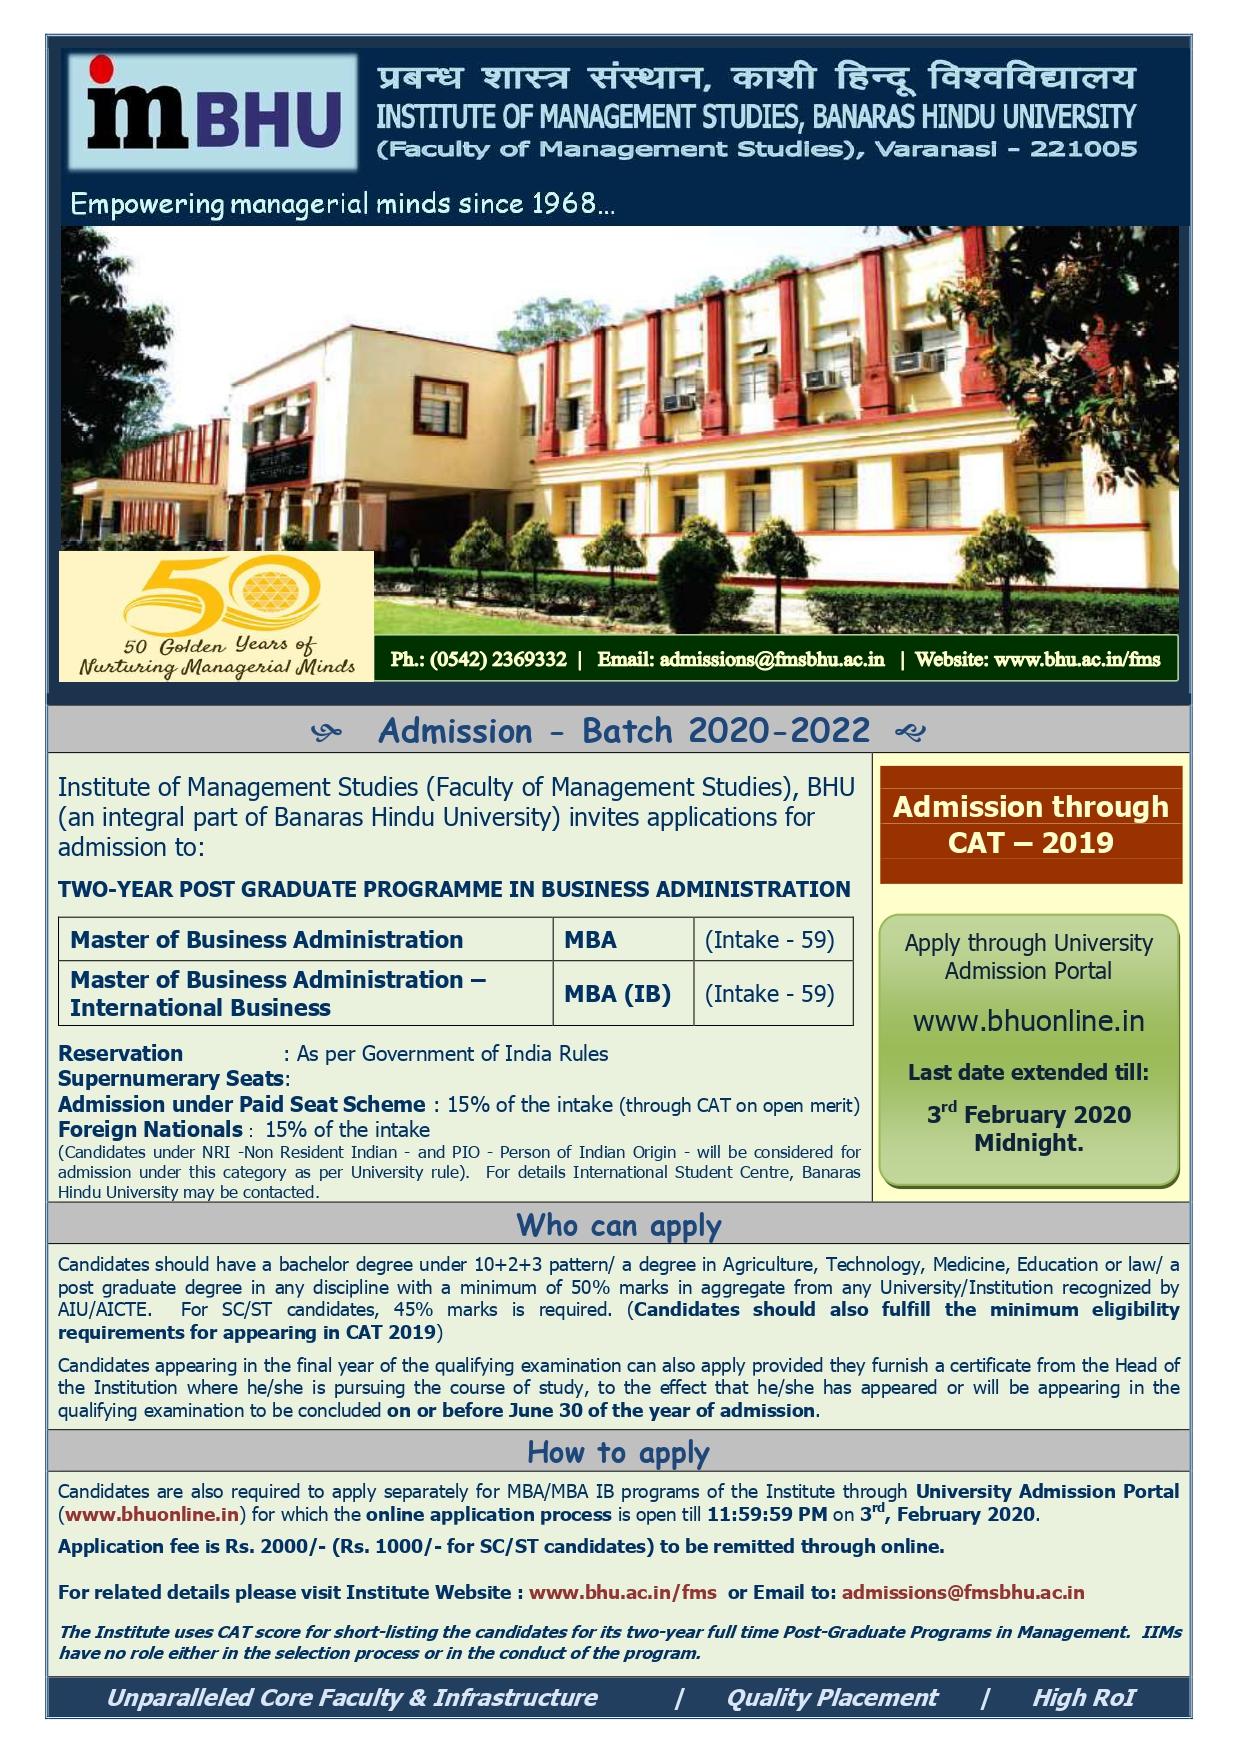 BHU FMS MBA 2020 Admission